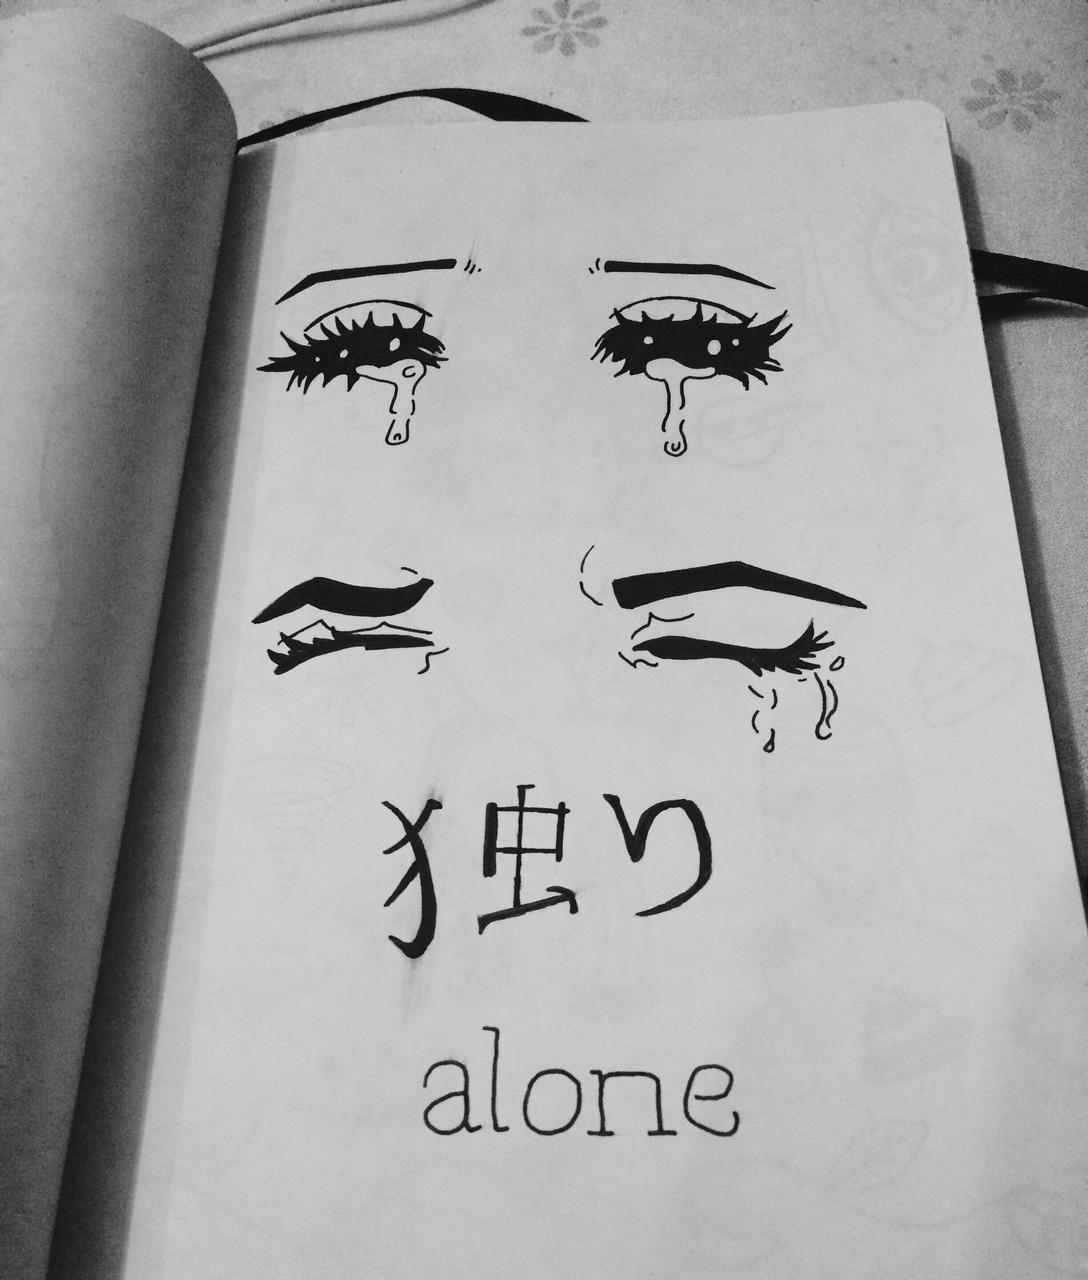 Drawn sad soft grunge About  in Image